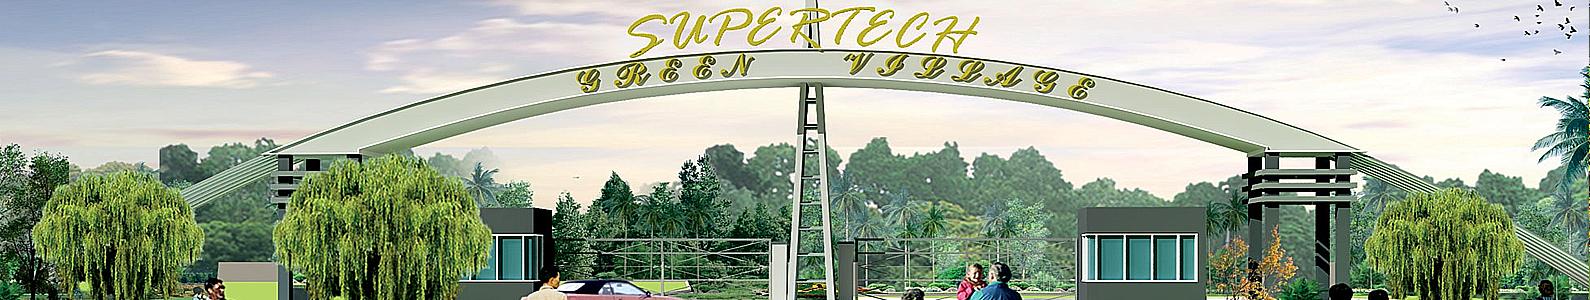 supertech green-village